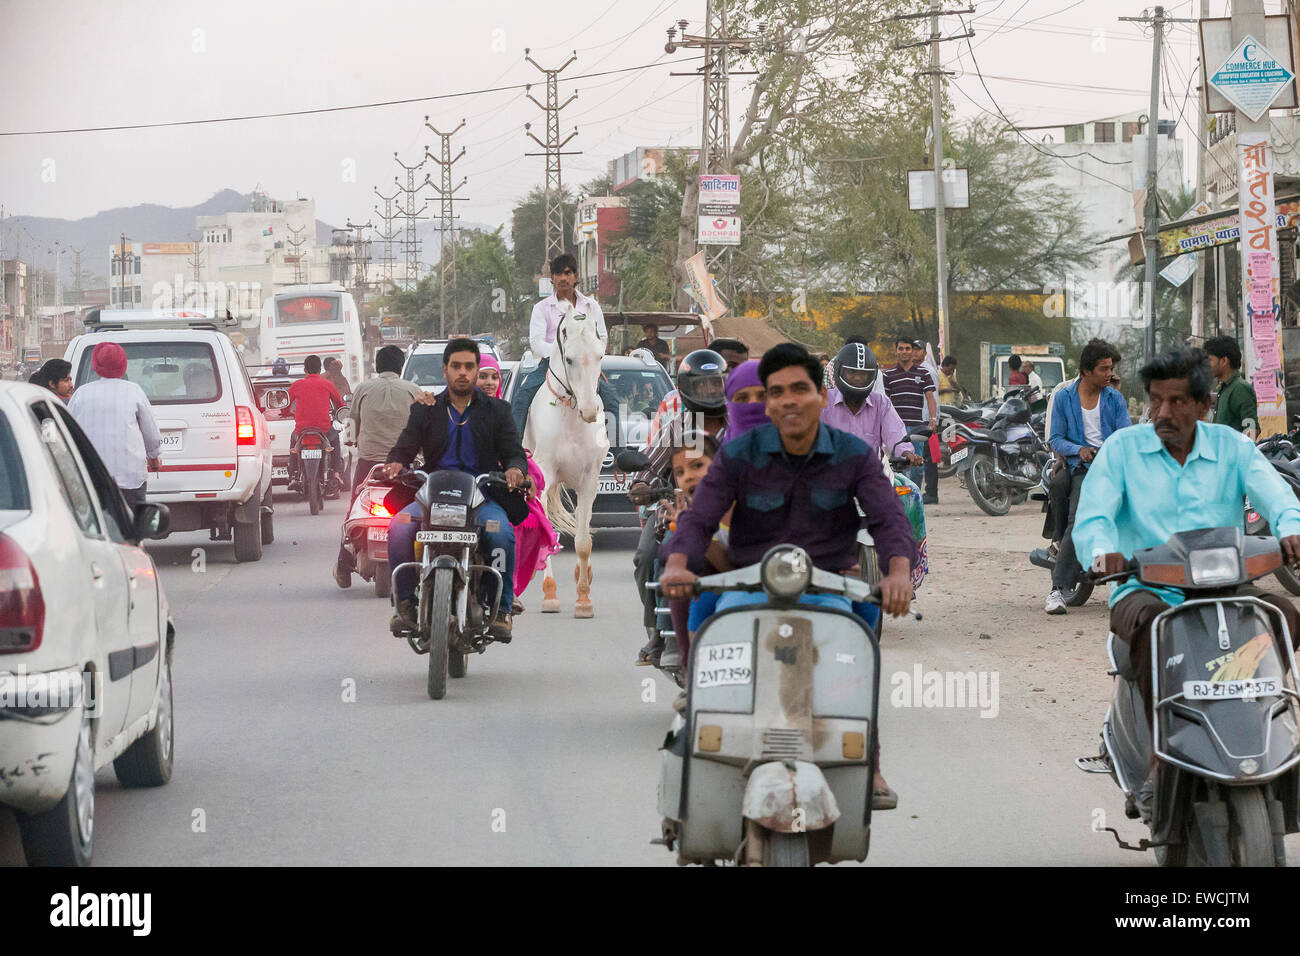 Street scene at Udaipur, Rajasthan, India - Stock Image